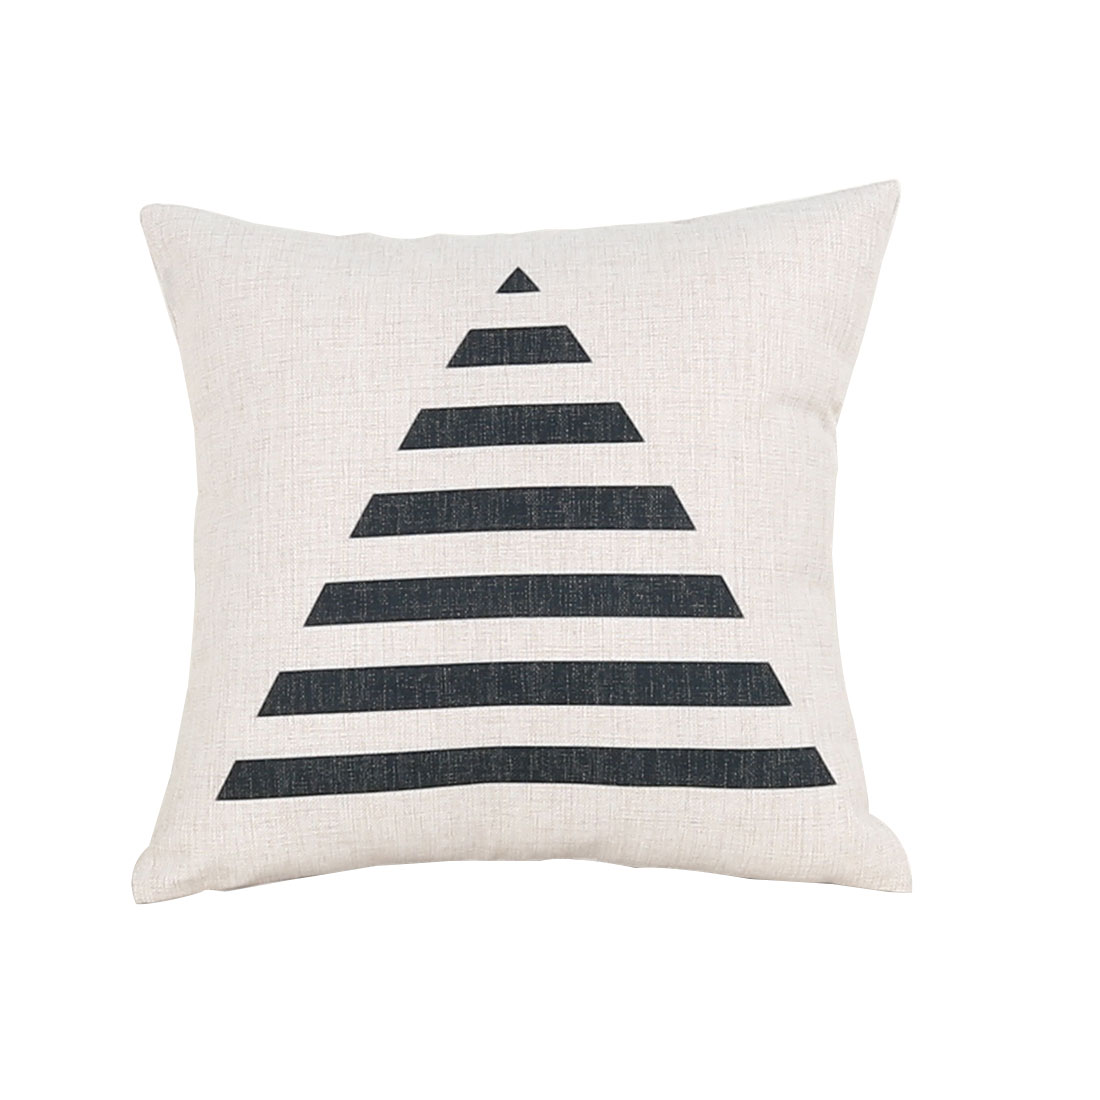 Sofa Cotton Linen Triangle Pattern Square Design Waist Throw Cushion Pillow Cover